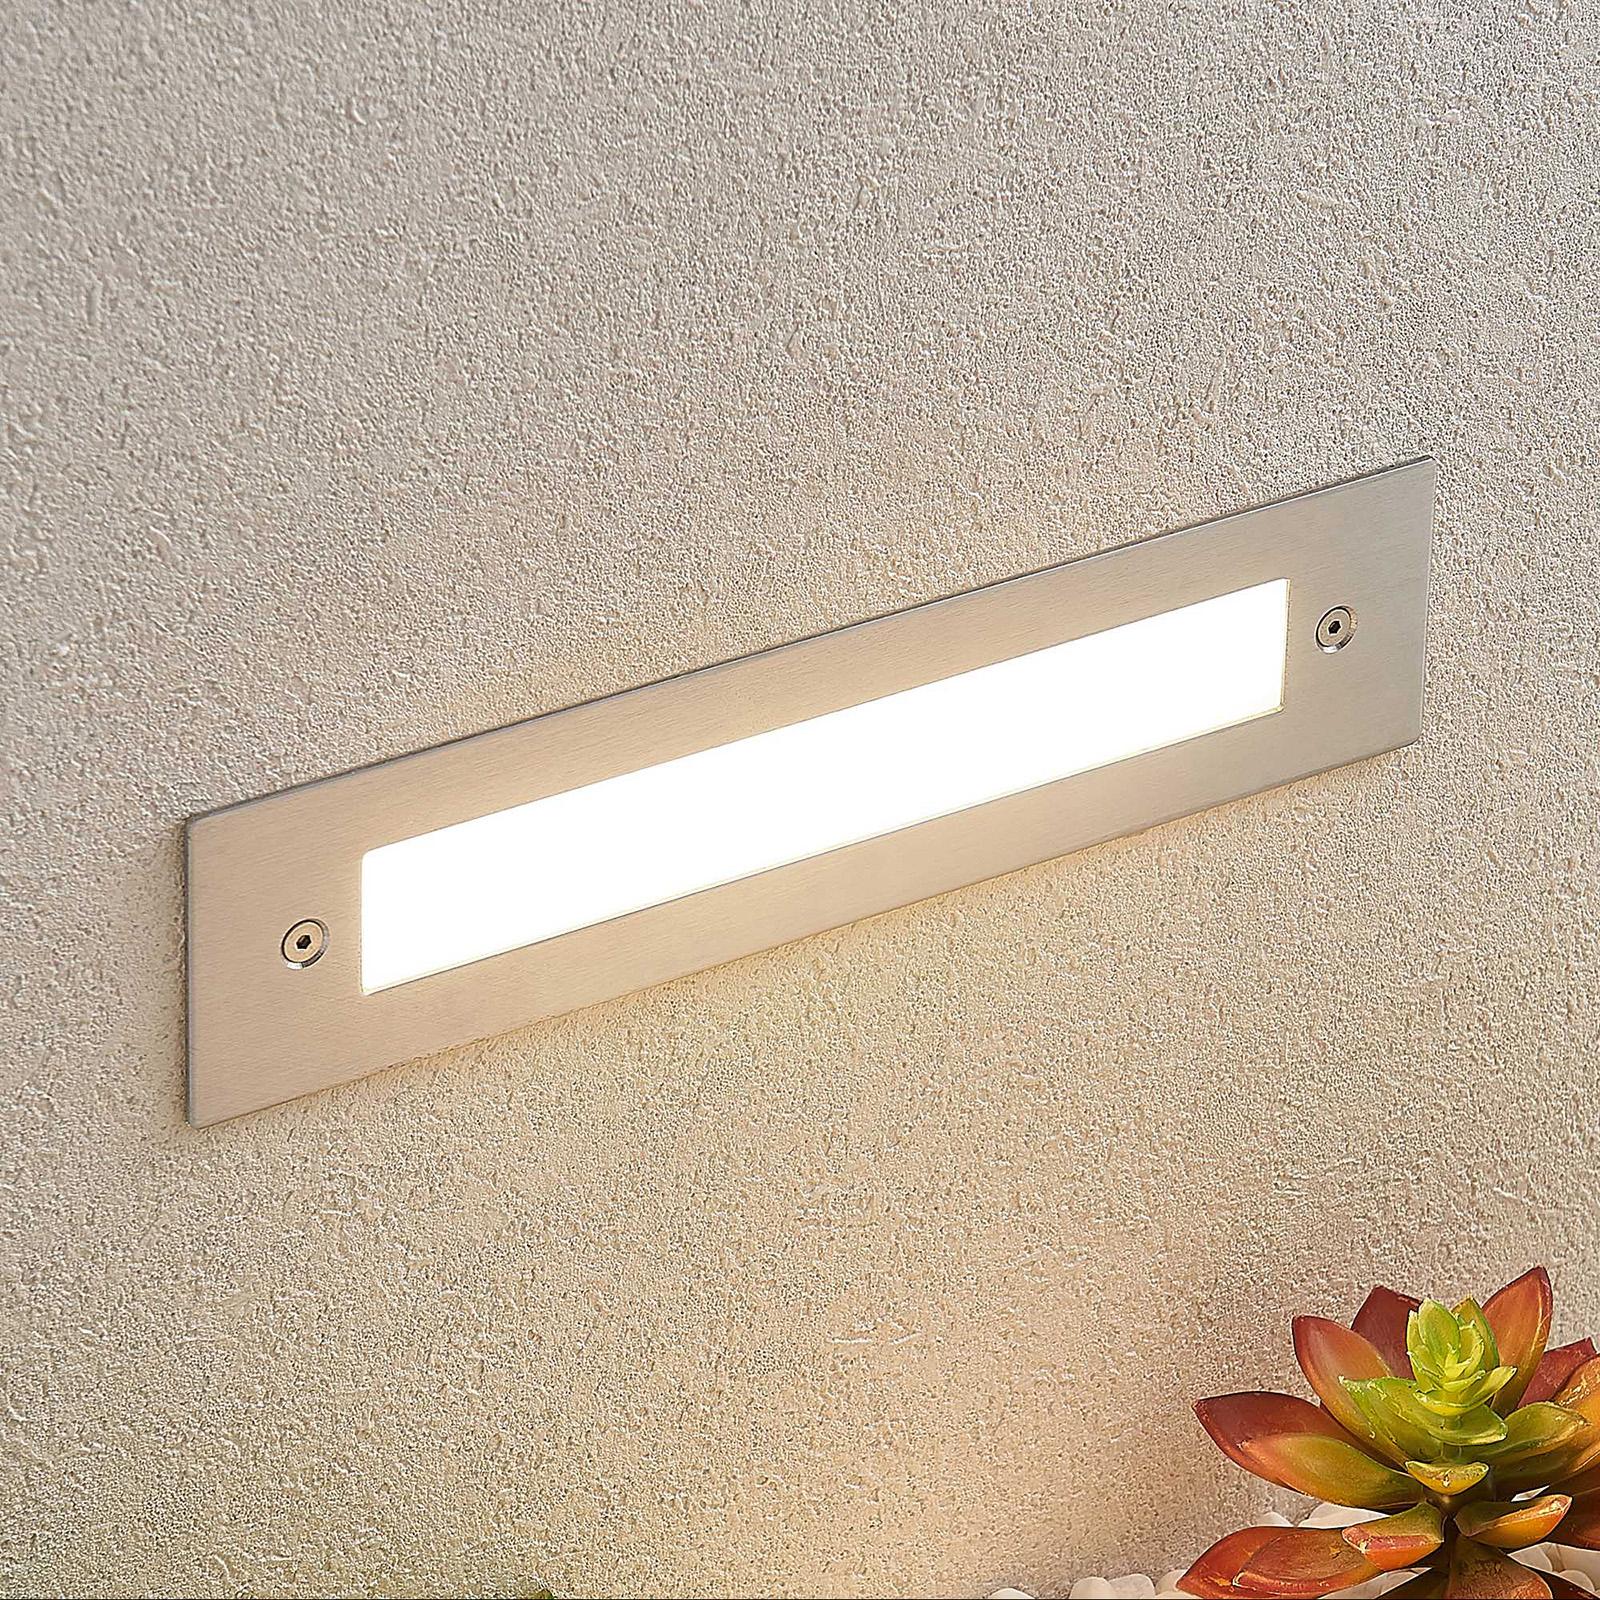 LED-Wandeinbauleuchte Roni, Edelstahl, 27 cm